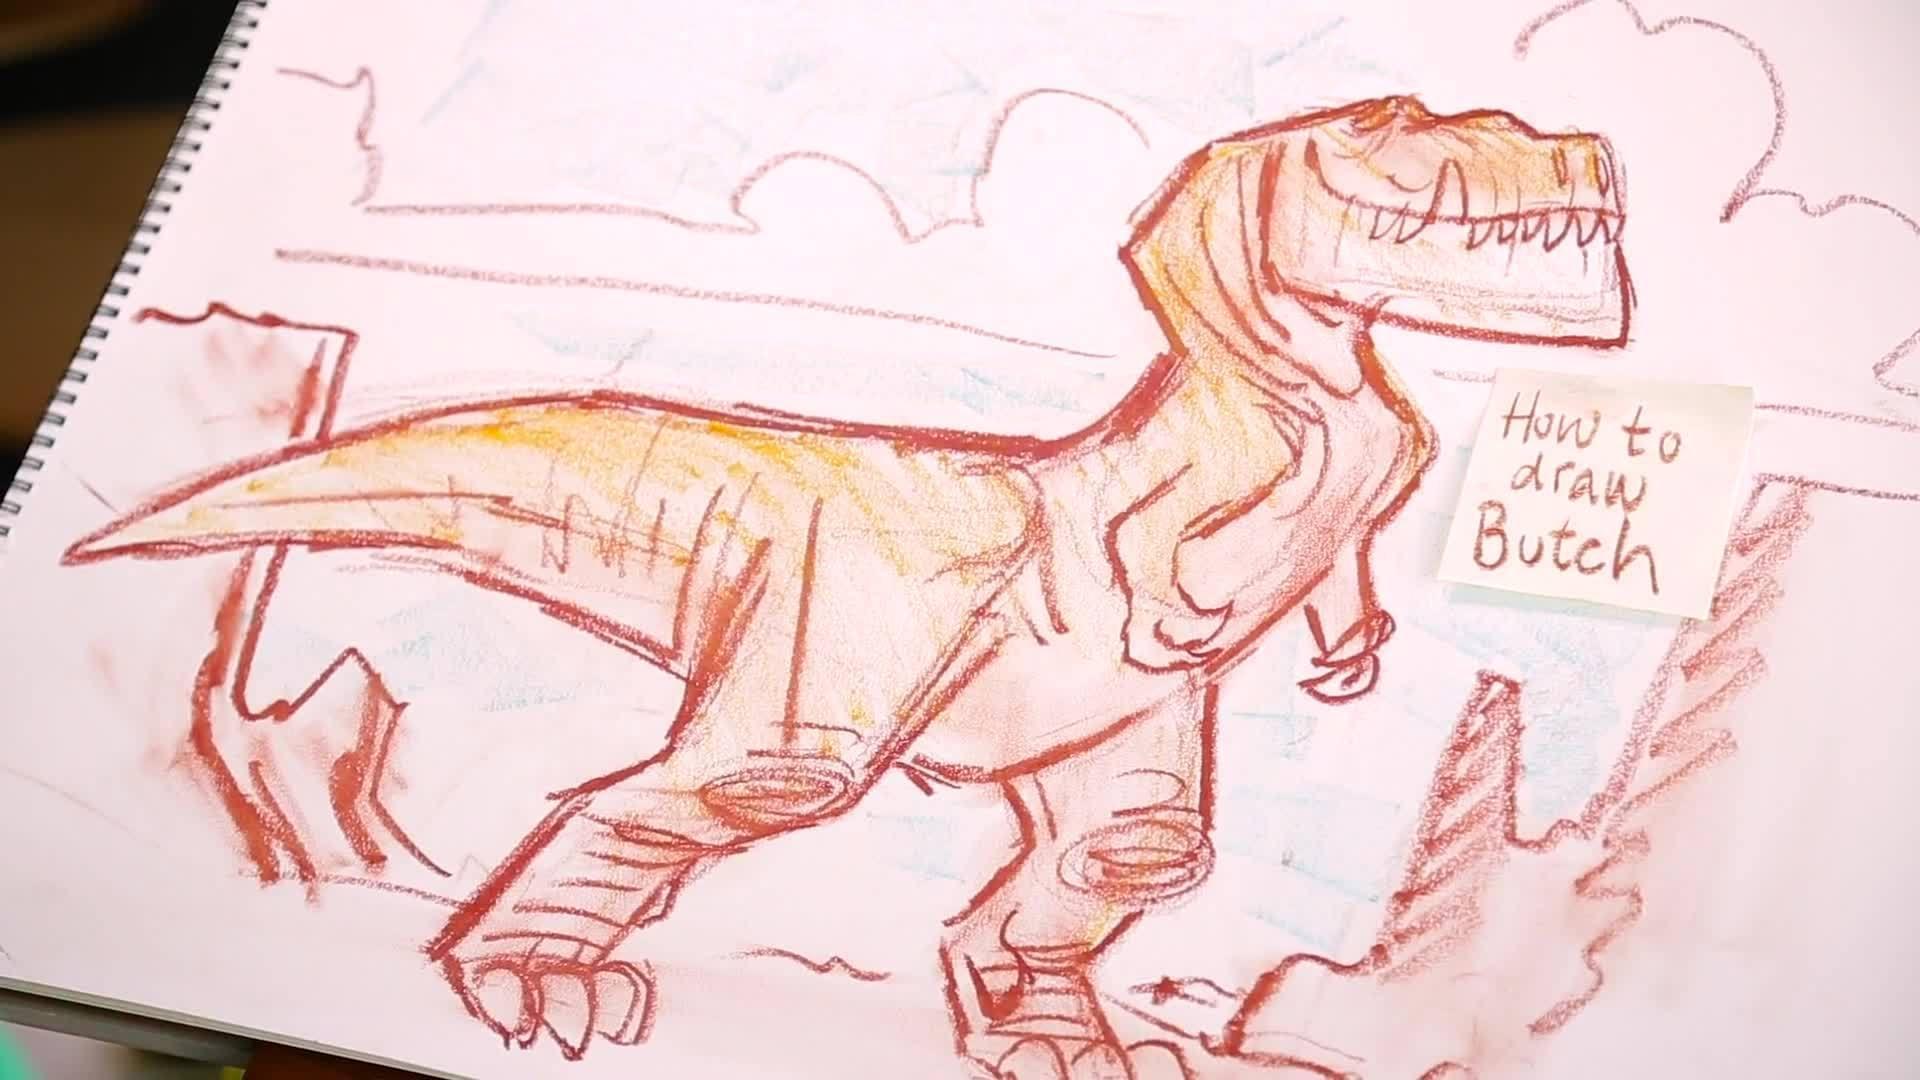 How to Draw Butch from Good Dinosaur   Disney Insider